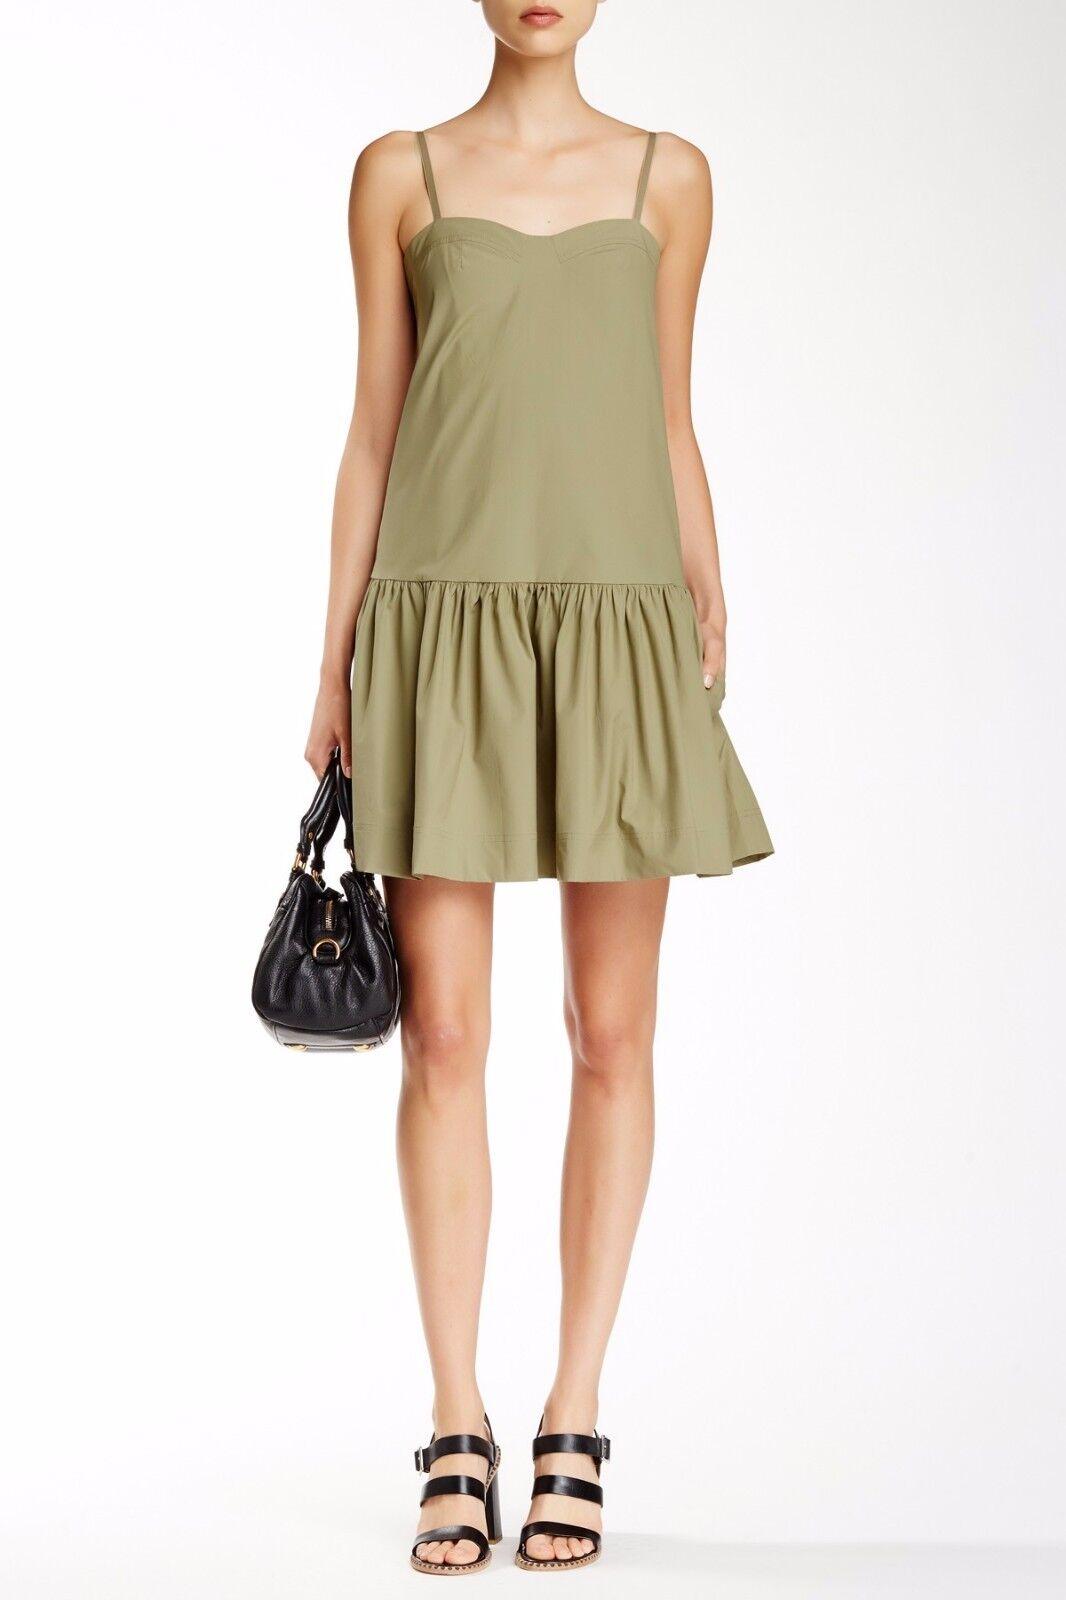 Marc by Marc Jacobs Lingerie Flouncy Shift Dress Size 4